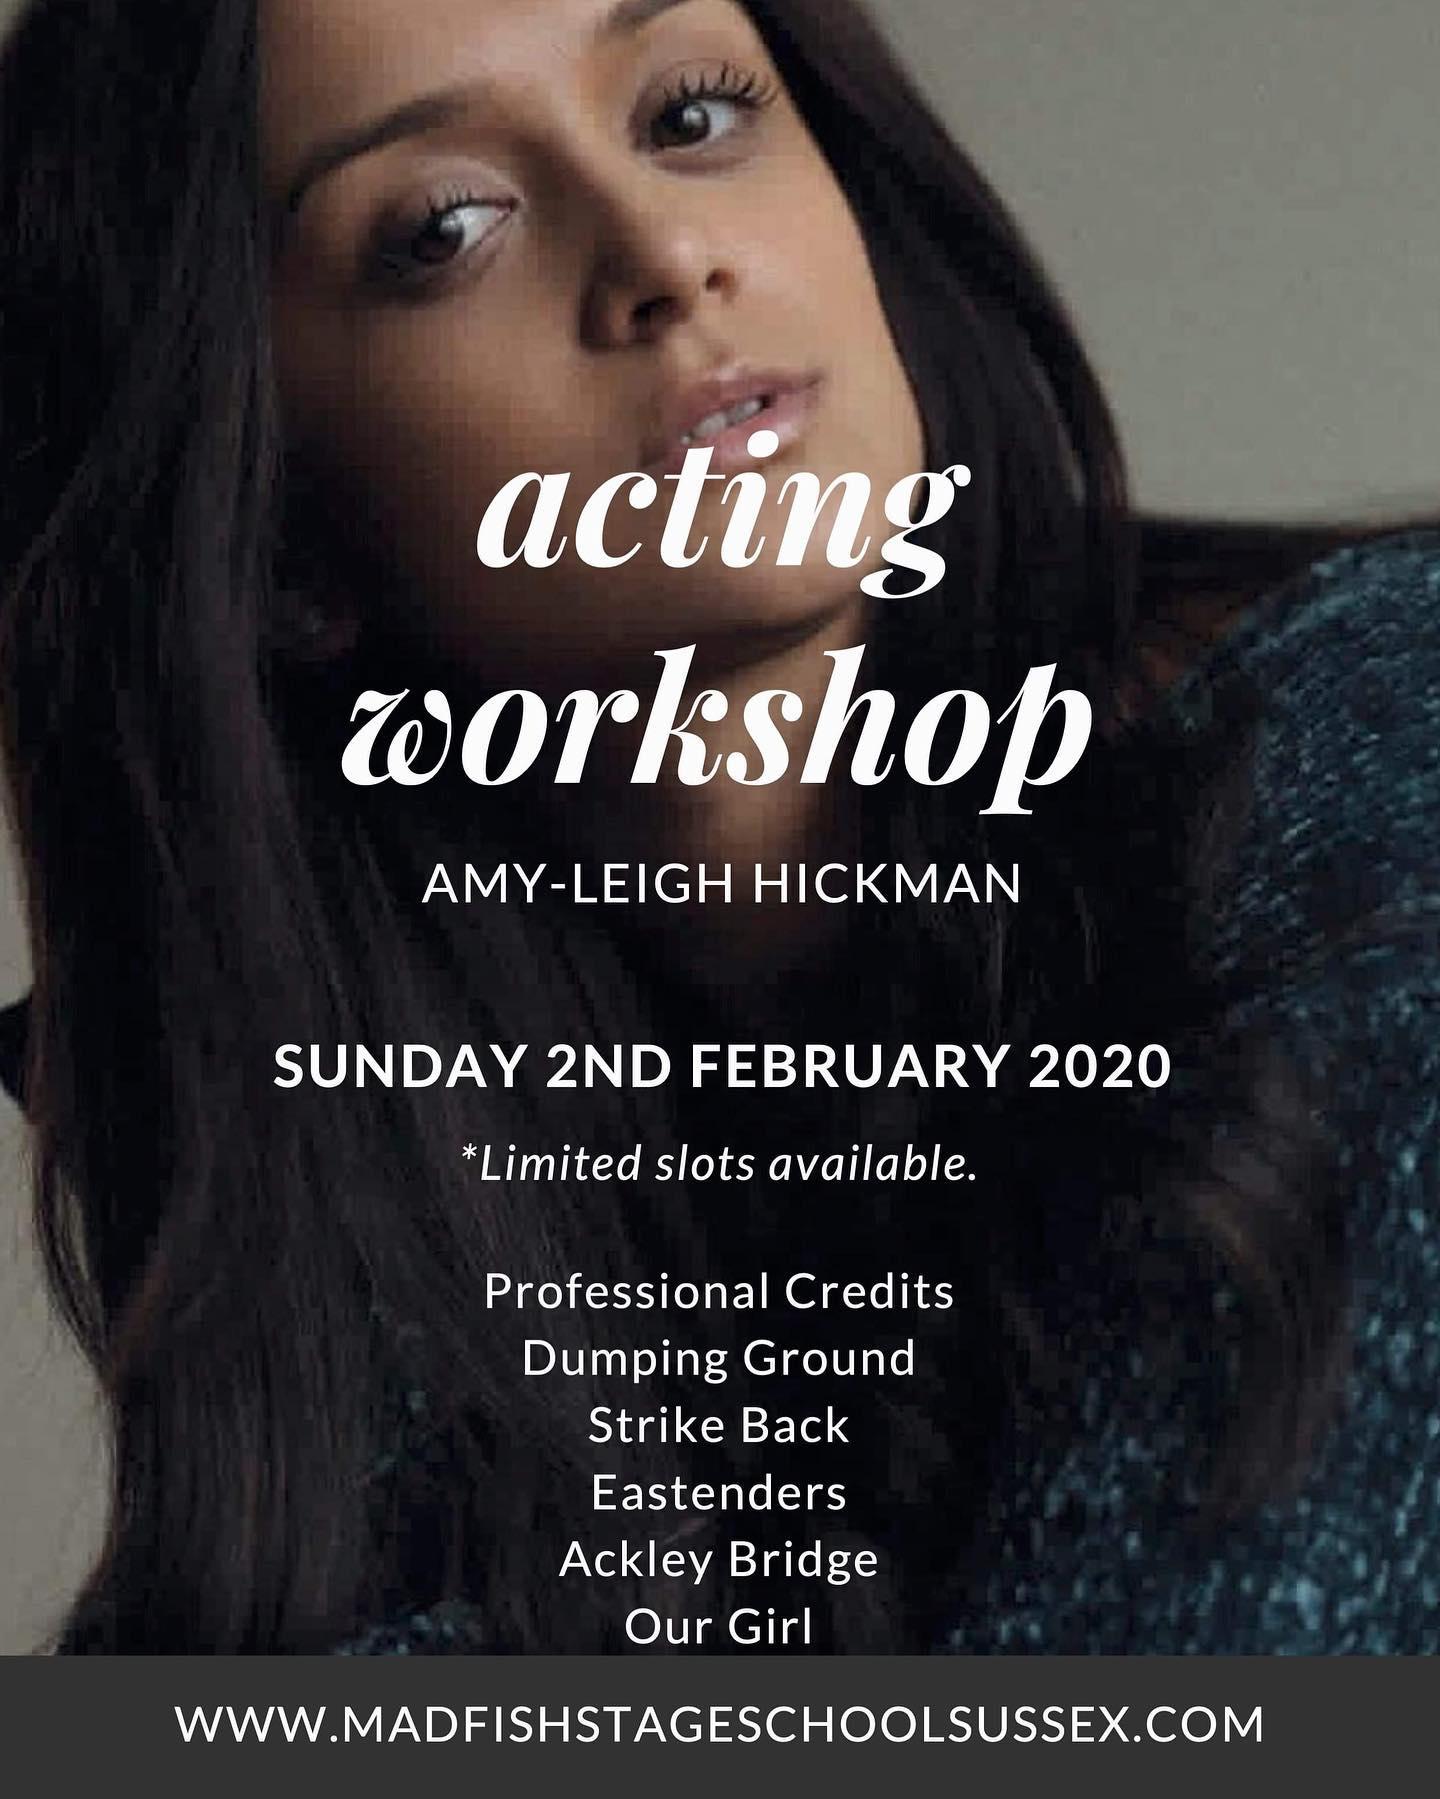 Amy Leigh Hickman